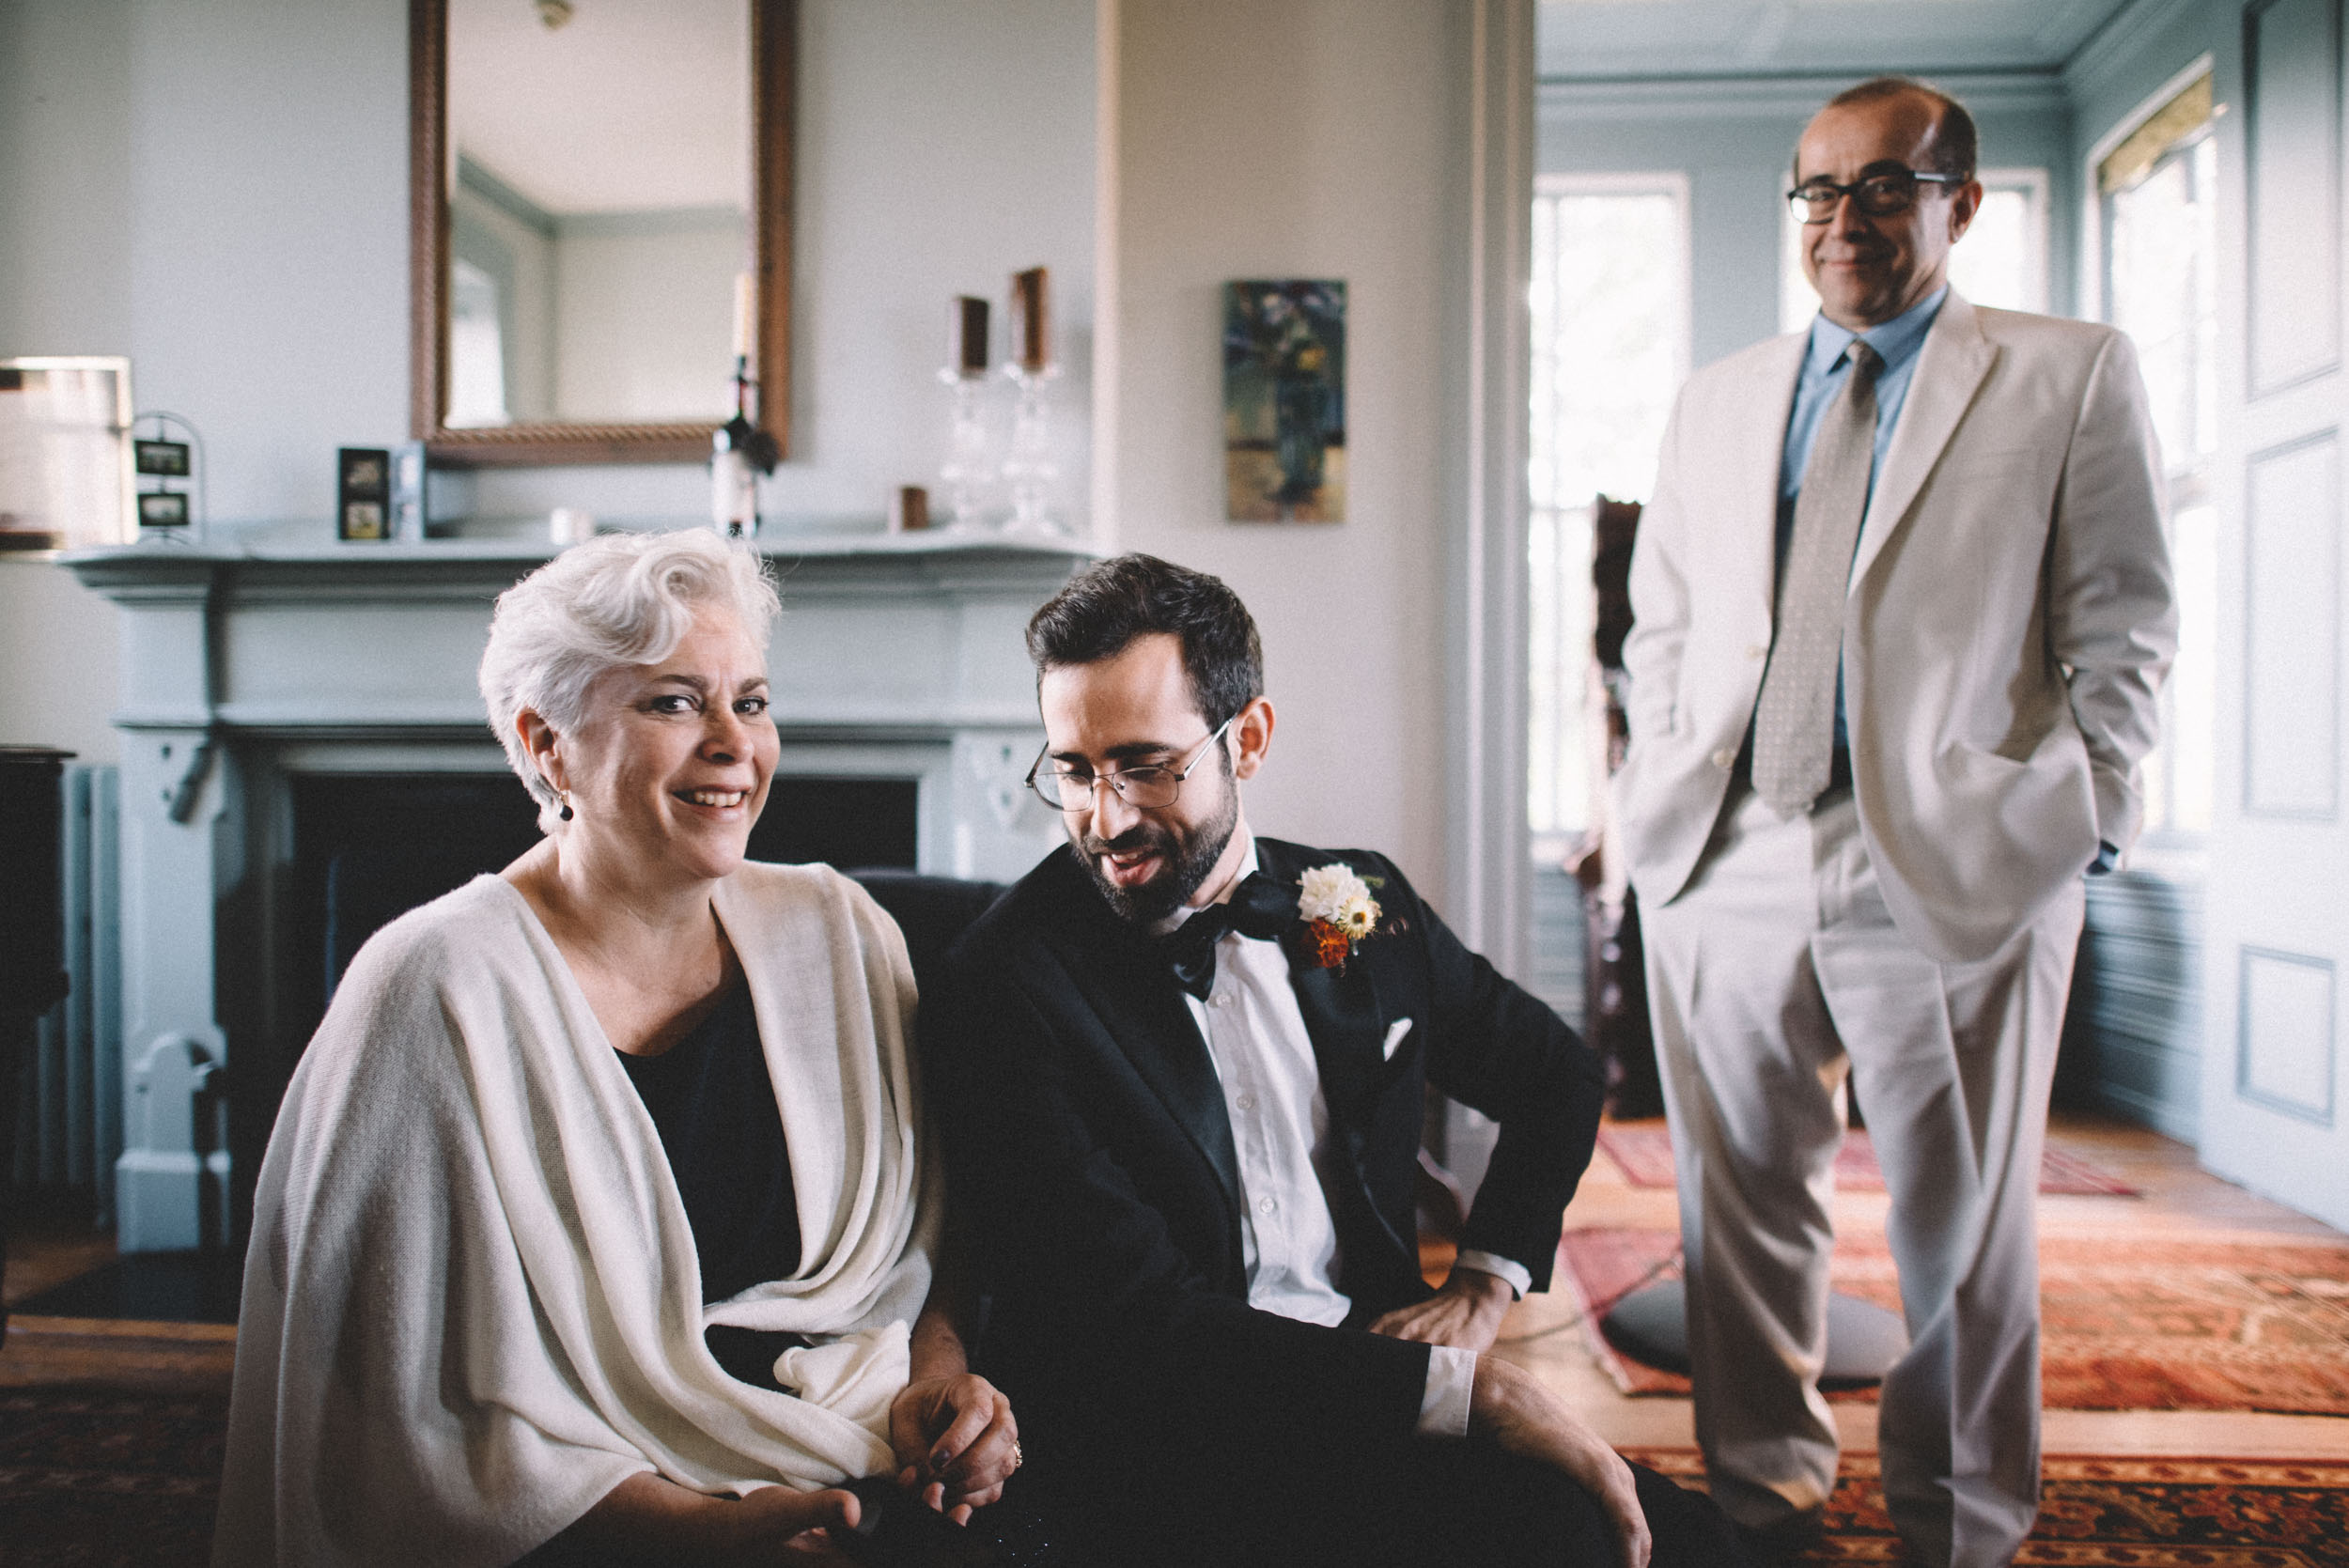 poolseville-maryland-wedding-photographer-28.jpg